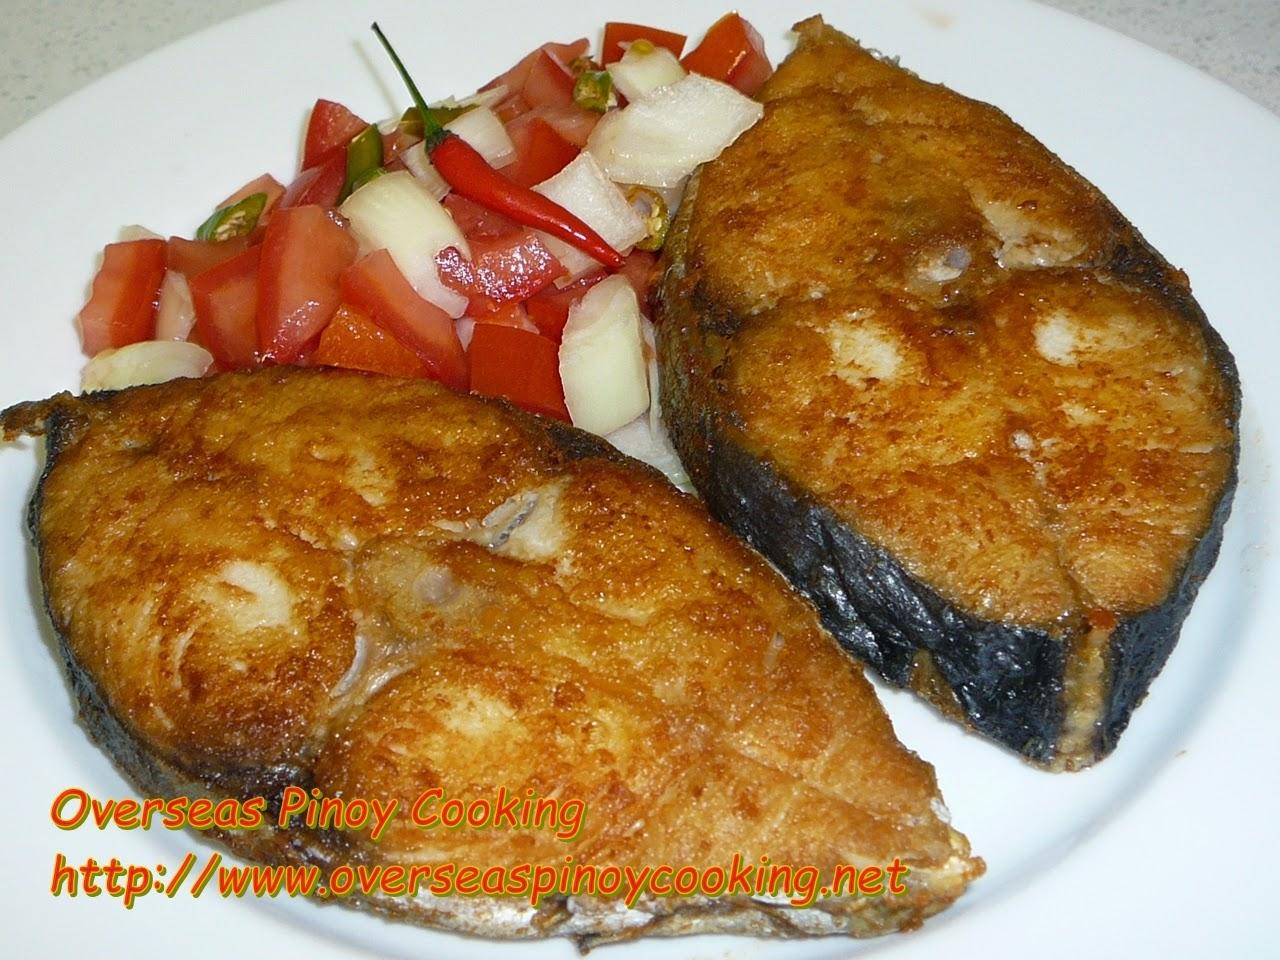 Fried Tanguigue Steak with Tomato Onion Chili Relish